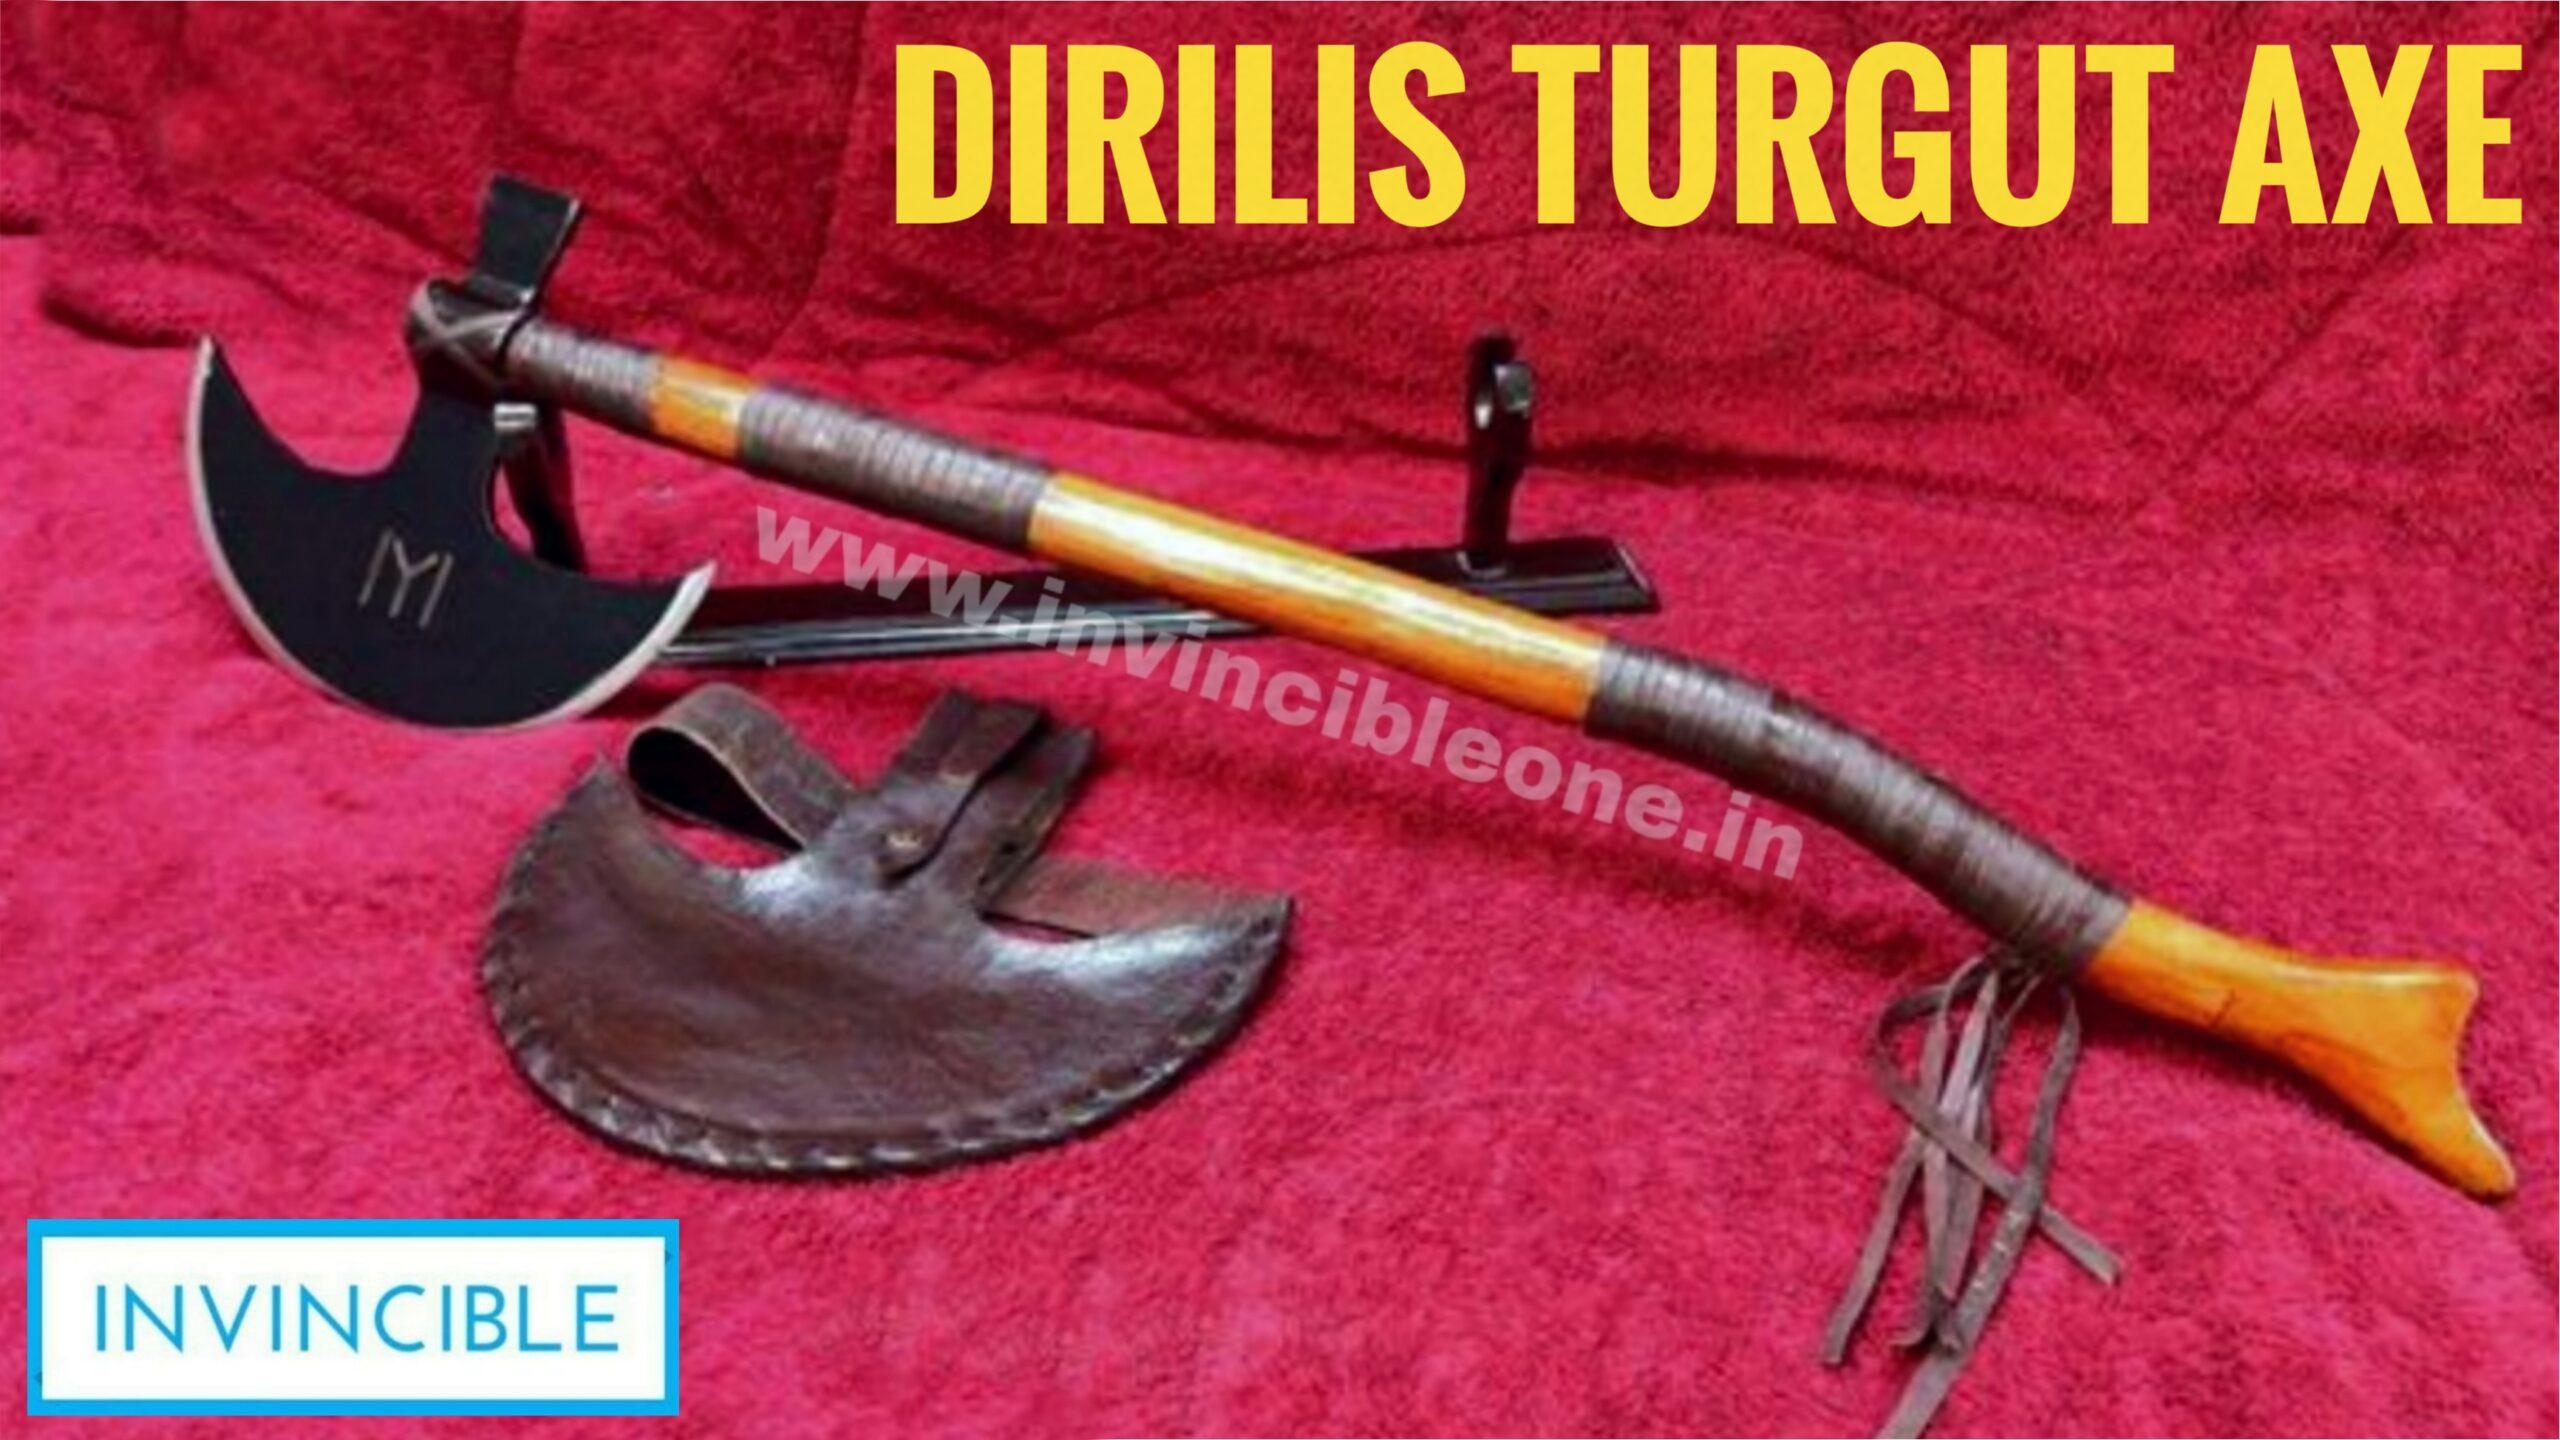 Dirilis Turgut Axe